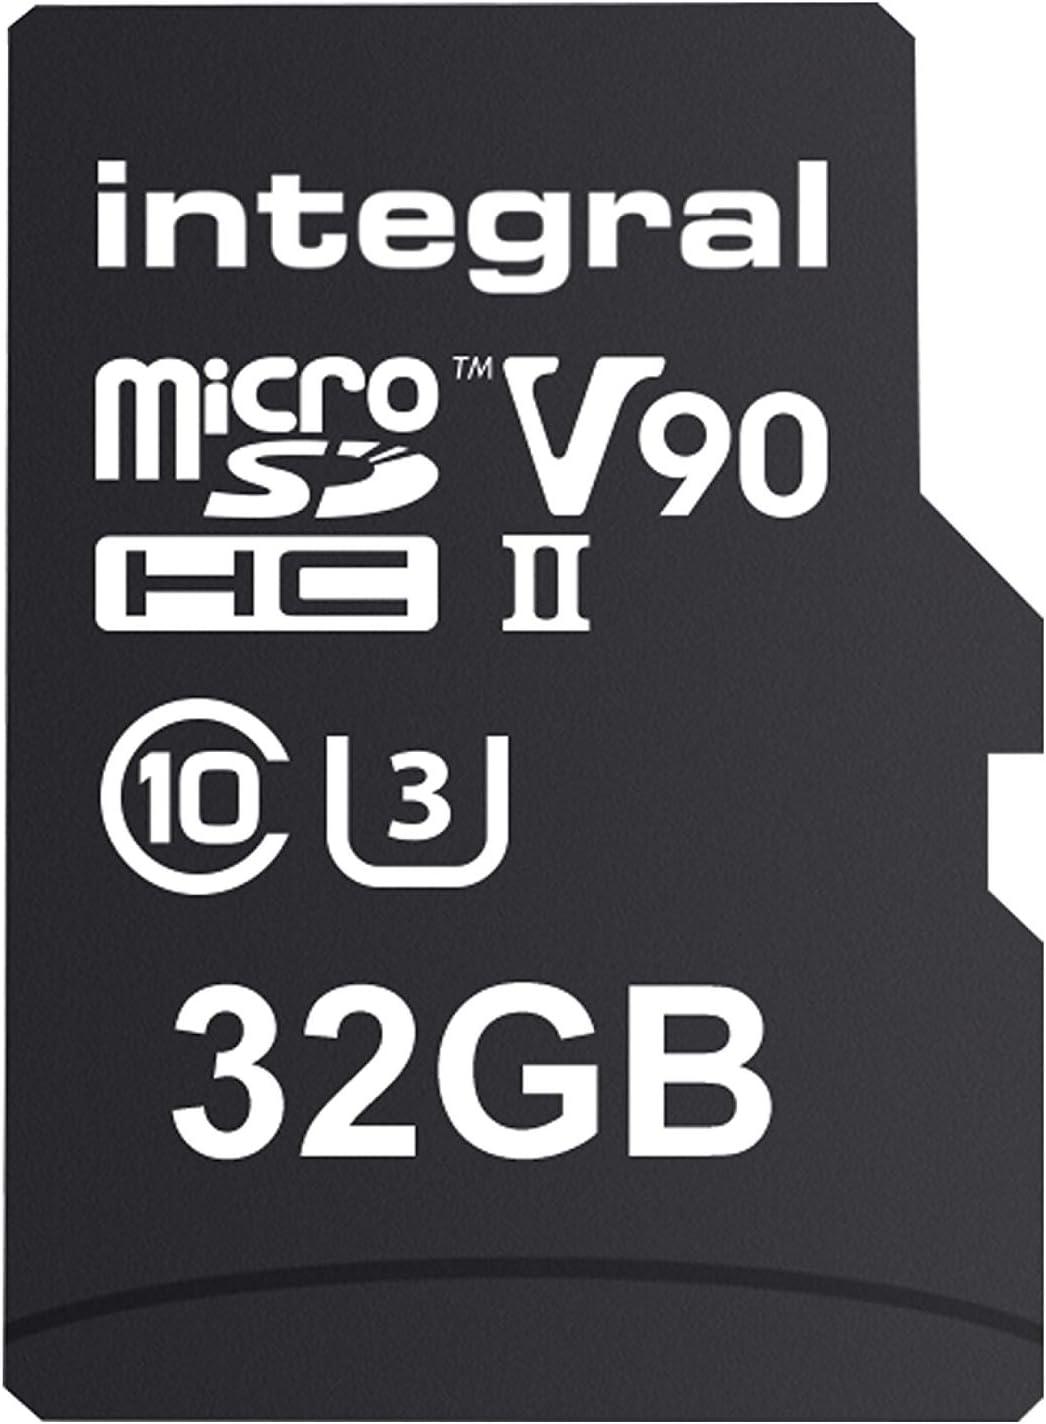 Integral Ultimapro X2 280 100 Uhs Ii V60 Microsdxc Computers Accessories